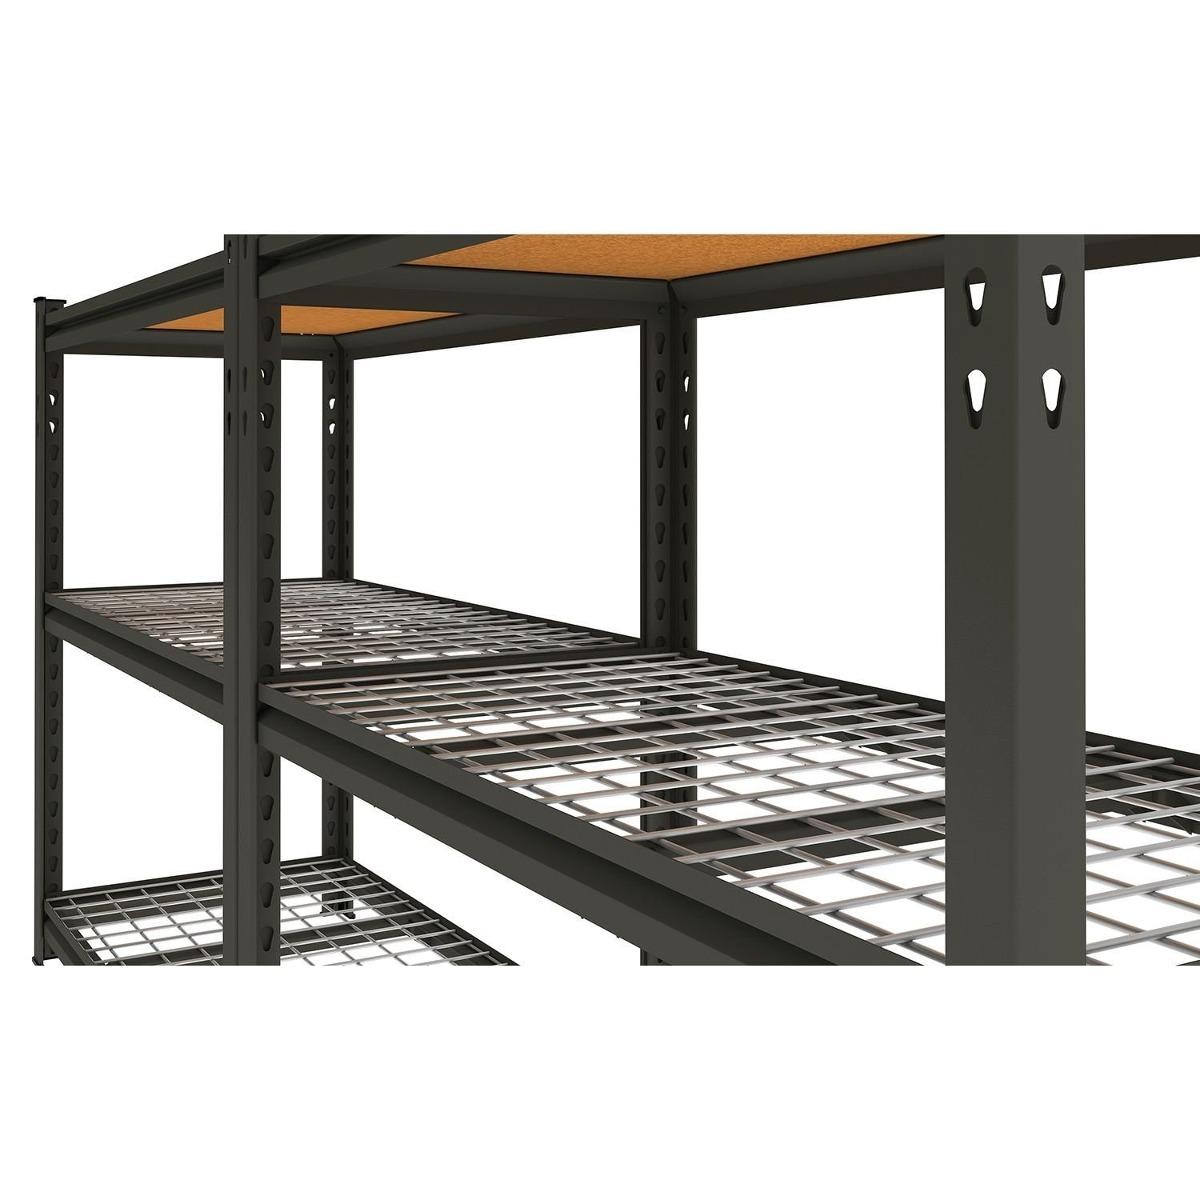 Estante Rack Anaquel 5 Repisas Organizador Garage Taller $ 3 999.00  #9C632F 1200x1200